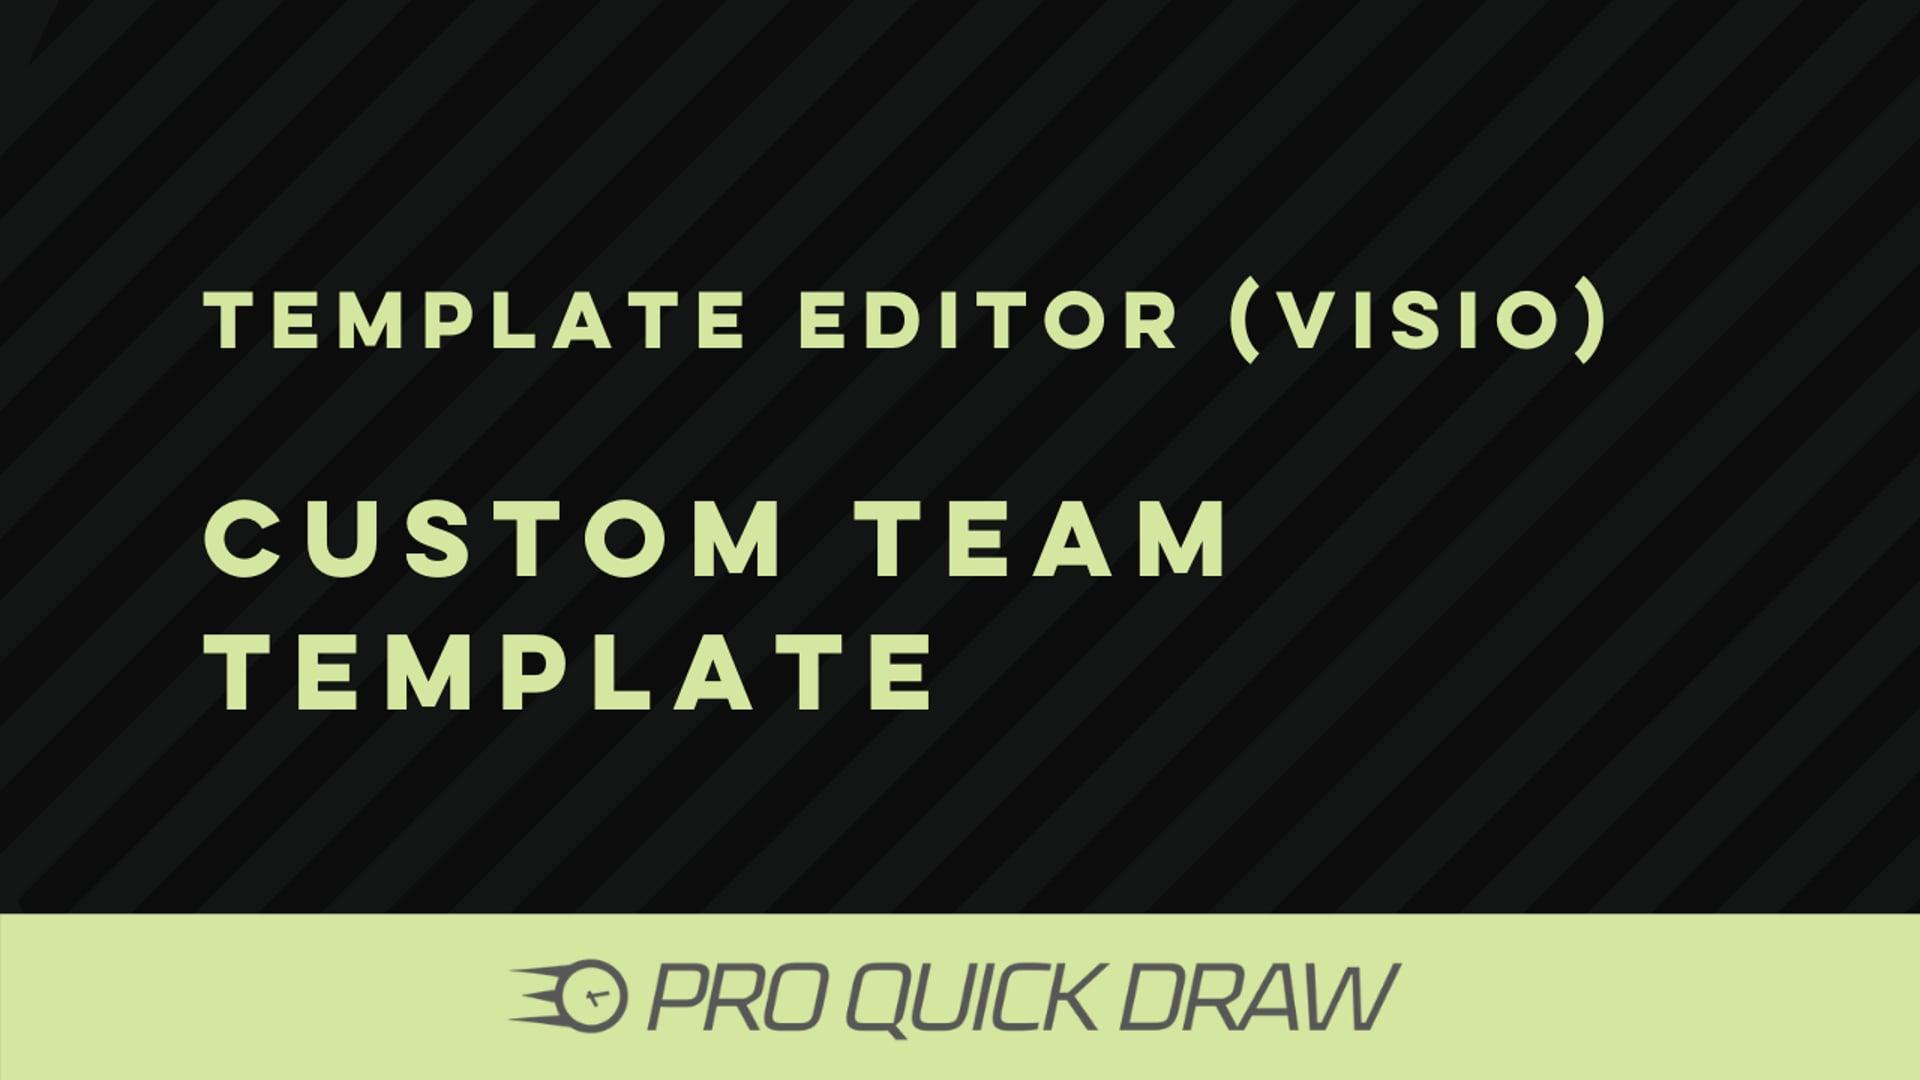 Template Editor (Visio): Making a Custom Team Template